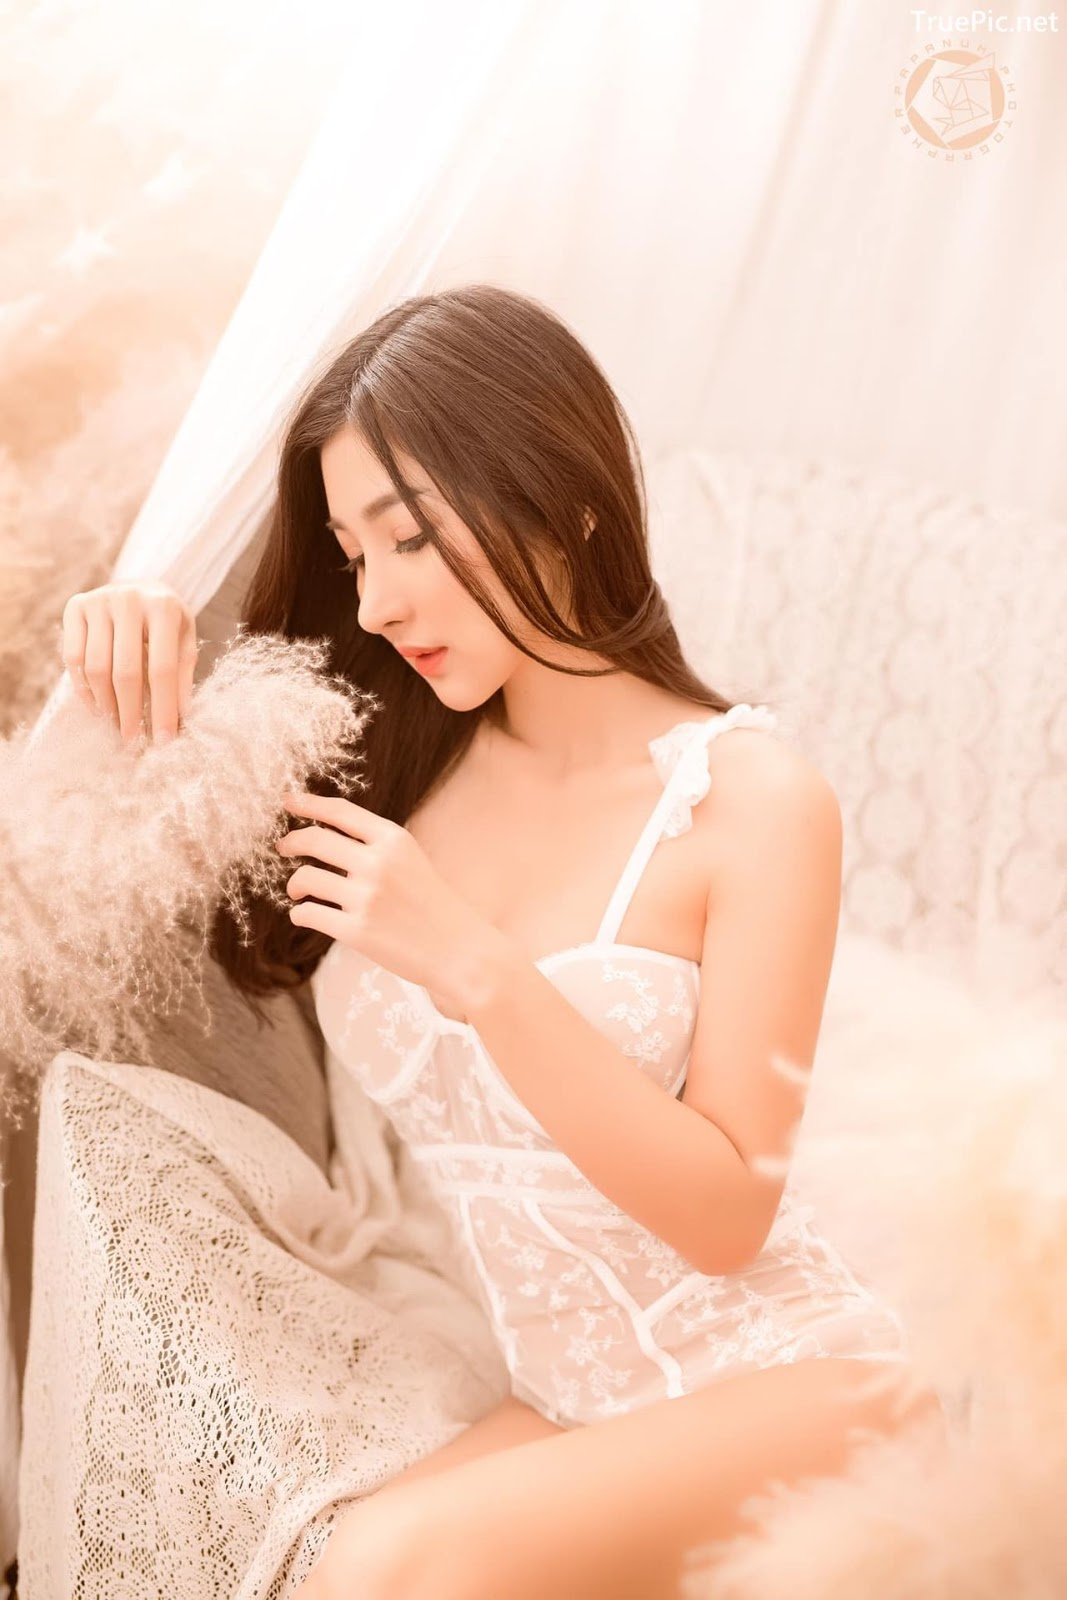 Image-Thailand-Sexy-Model-Pattamaporn-Keawkum-White-Transparent-Lingerie-TruePic.net- Picture-2